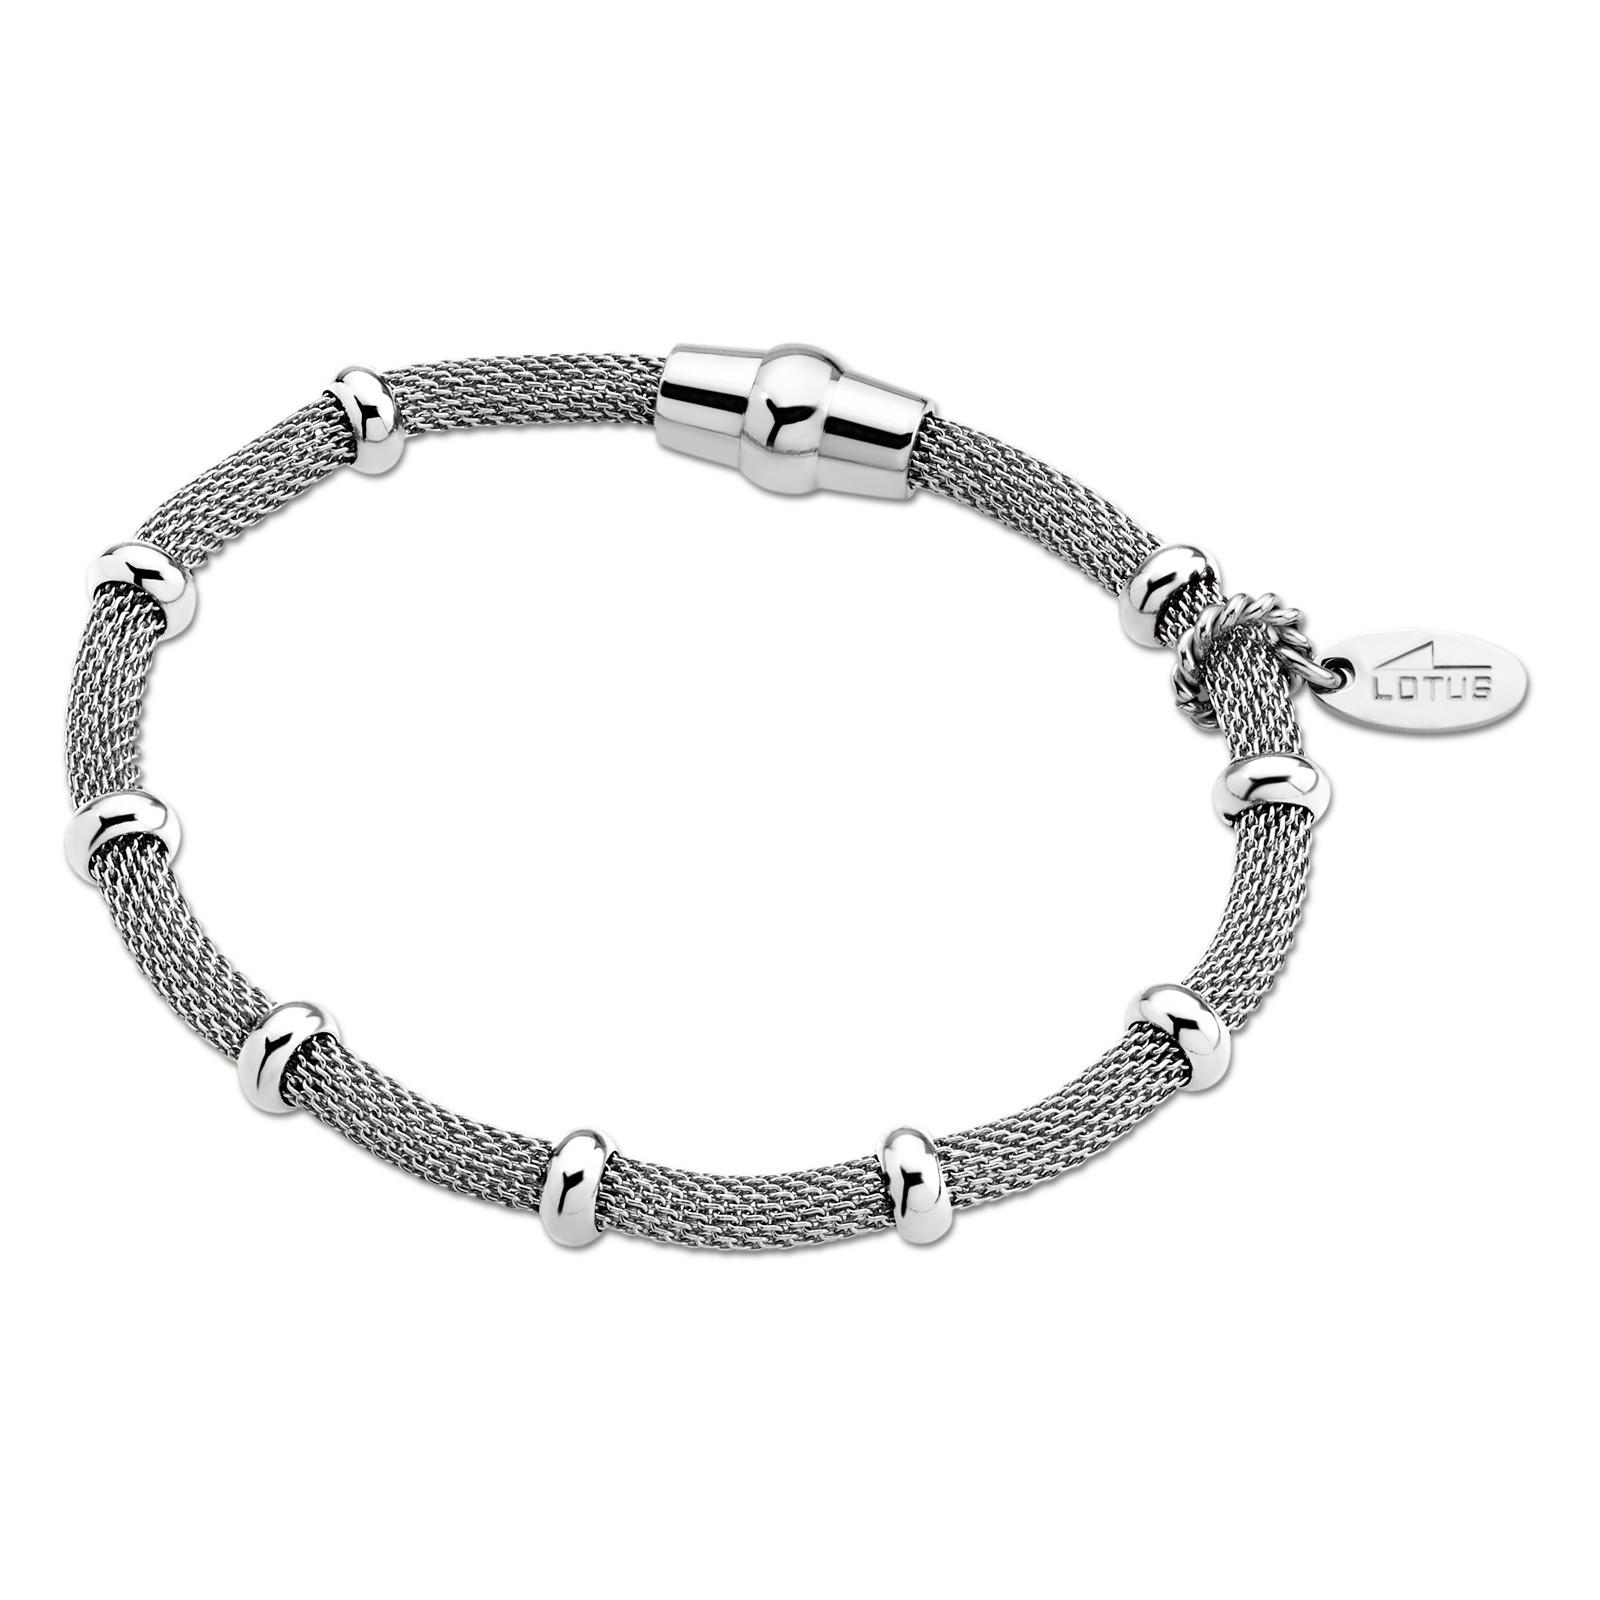 LOTUS Style Damen Armband Trendy-Kollektion Edelstahl JLS1680-2-1